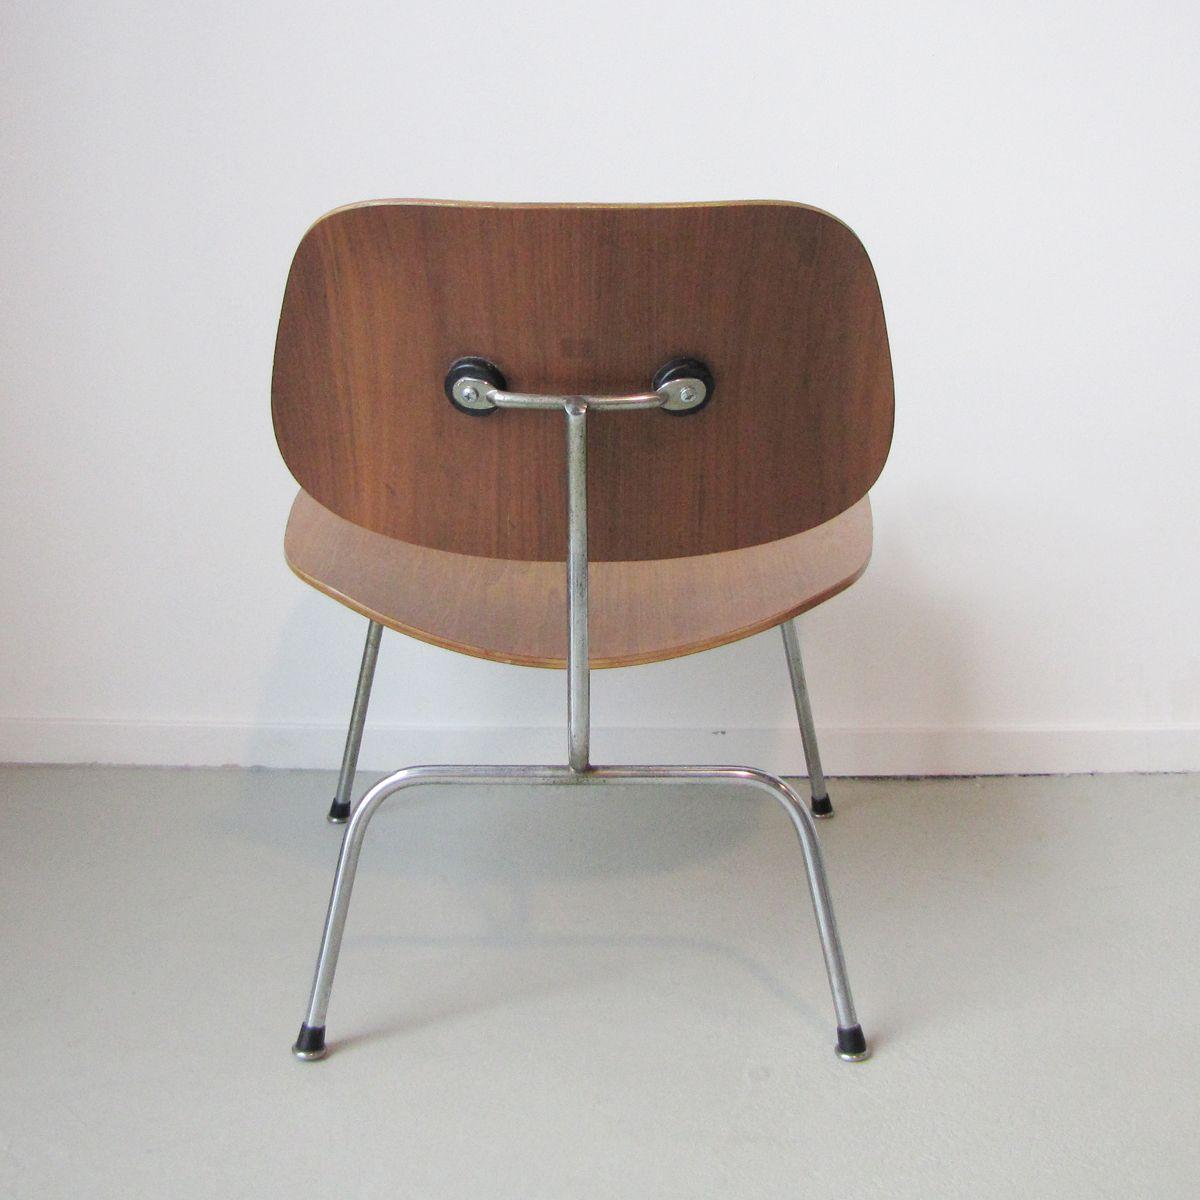 lcm stuhl von charles ray eames f r herman miller 1954 bei pamono kaufen. Black Bedroom Furniture Sets. Home Design Ideas